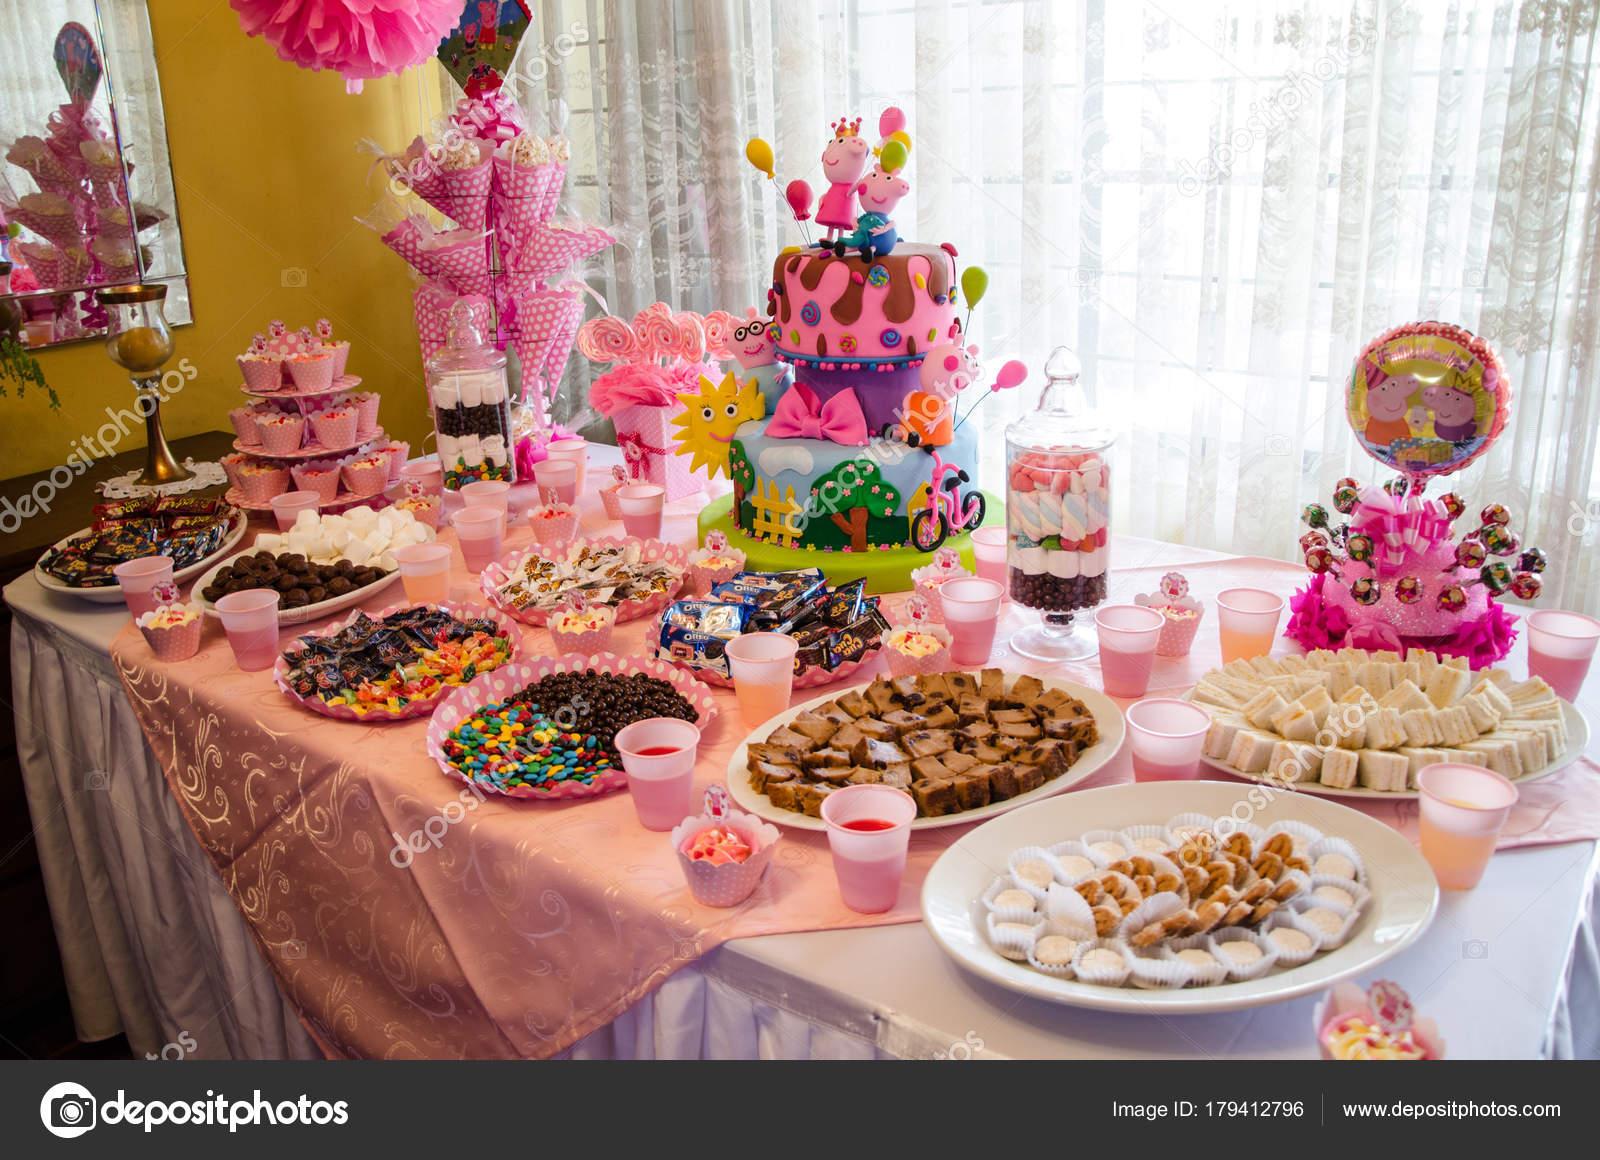 Buffet Di Dolci Per Bambini : Ricette per buffet gallerie di misya